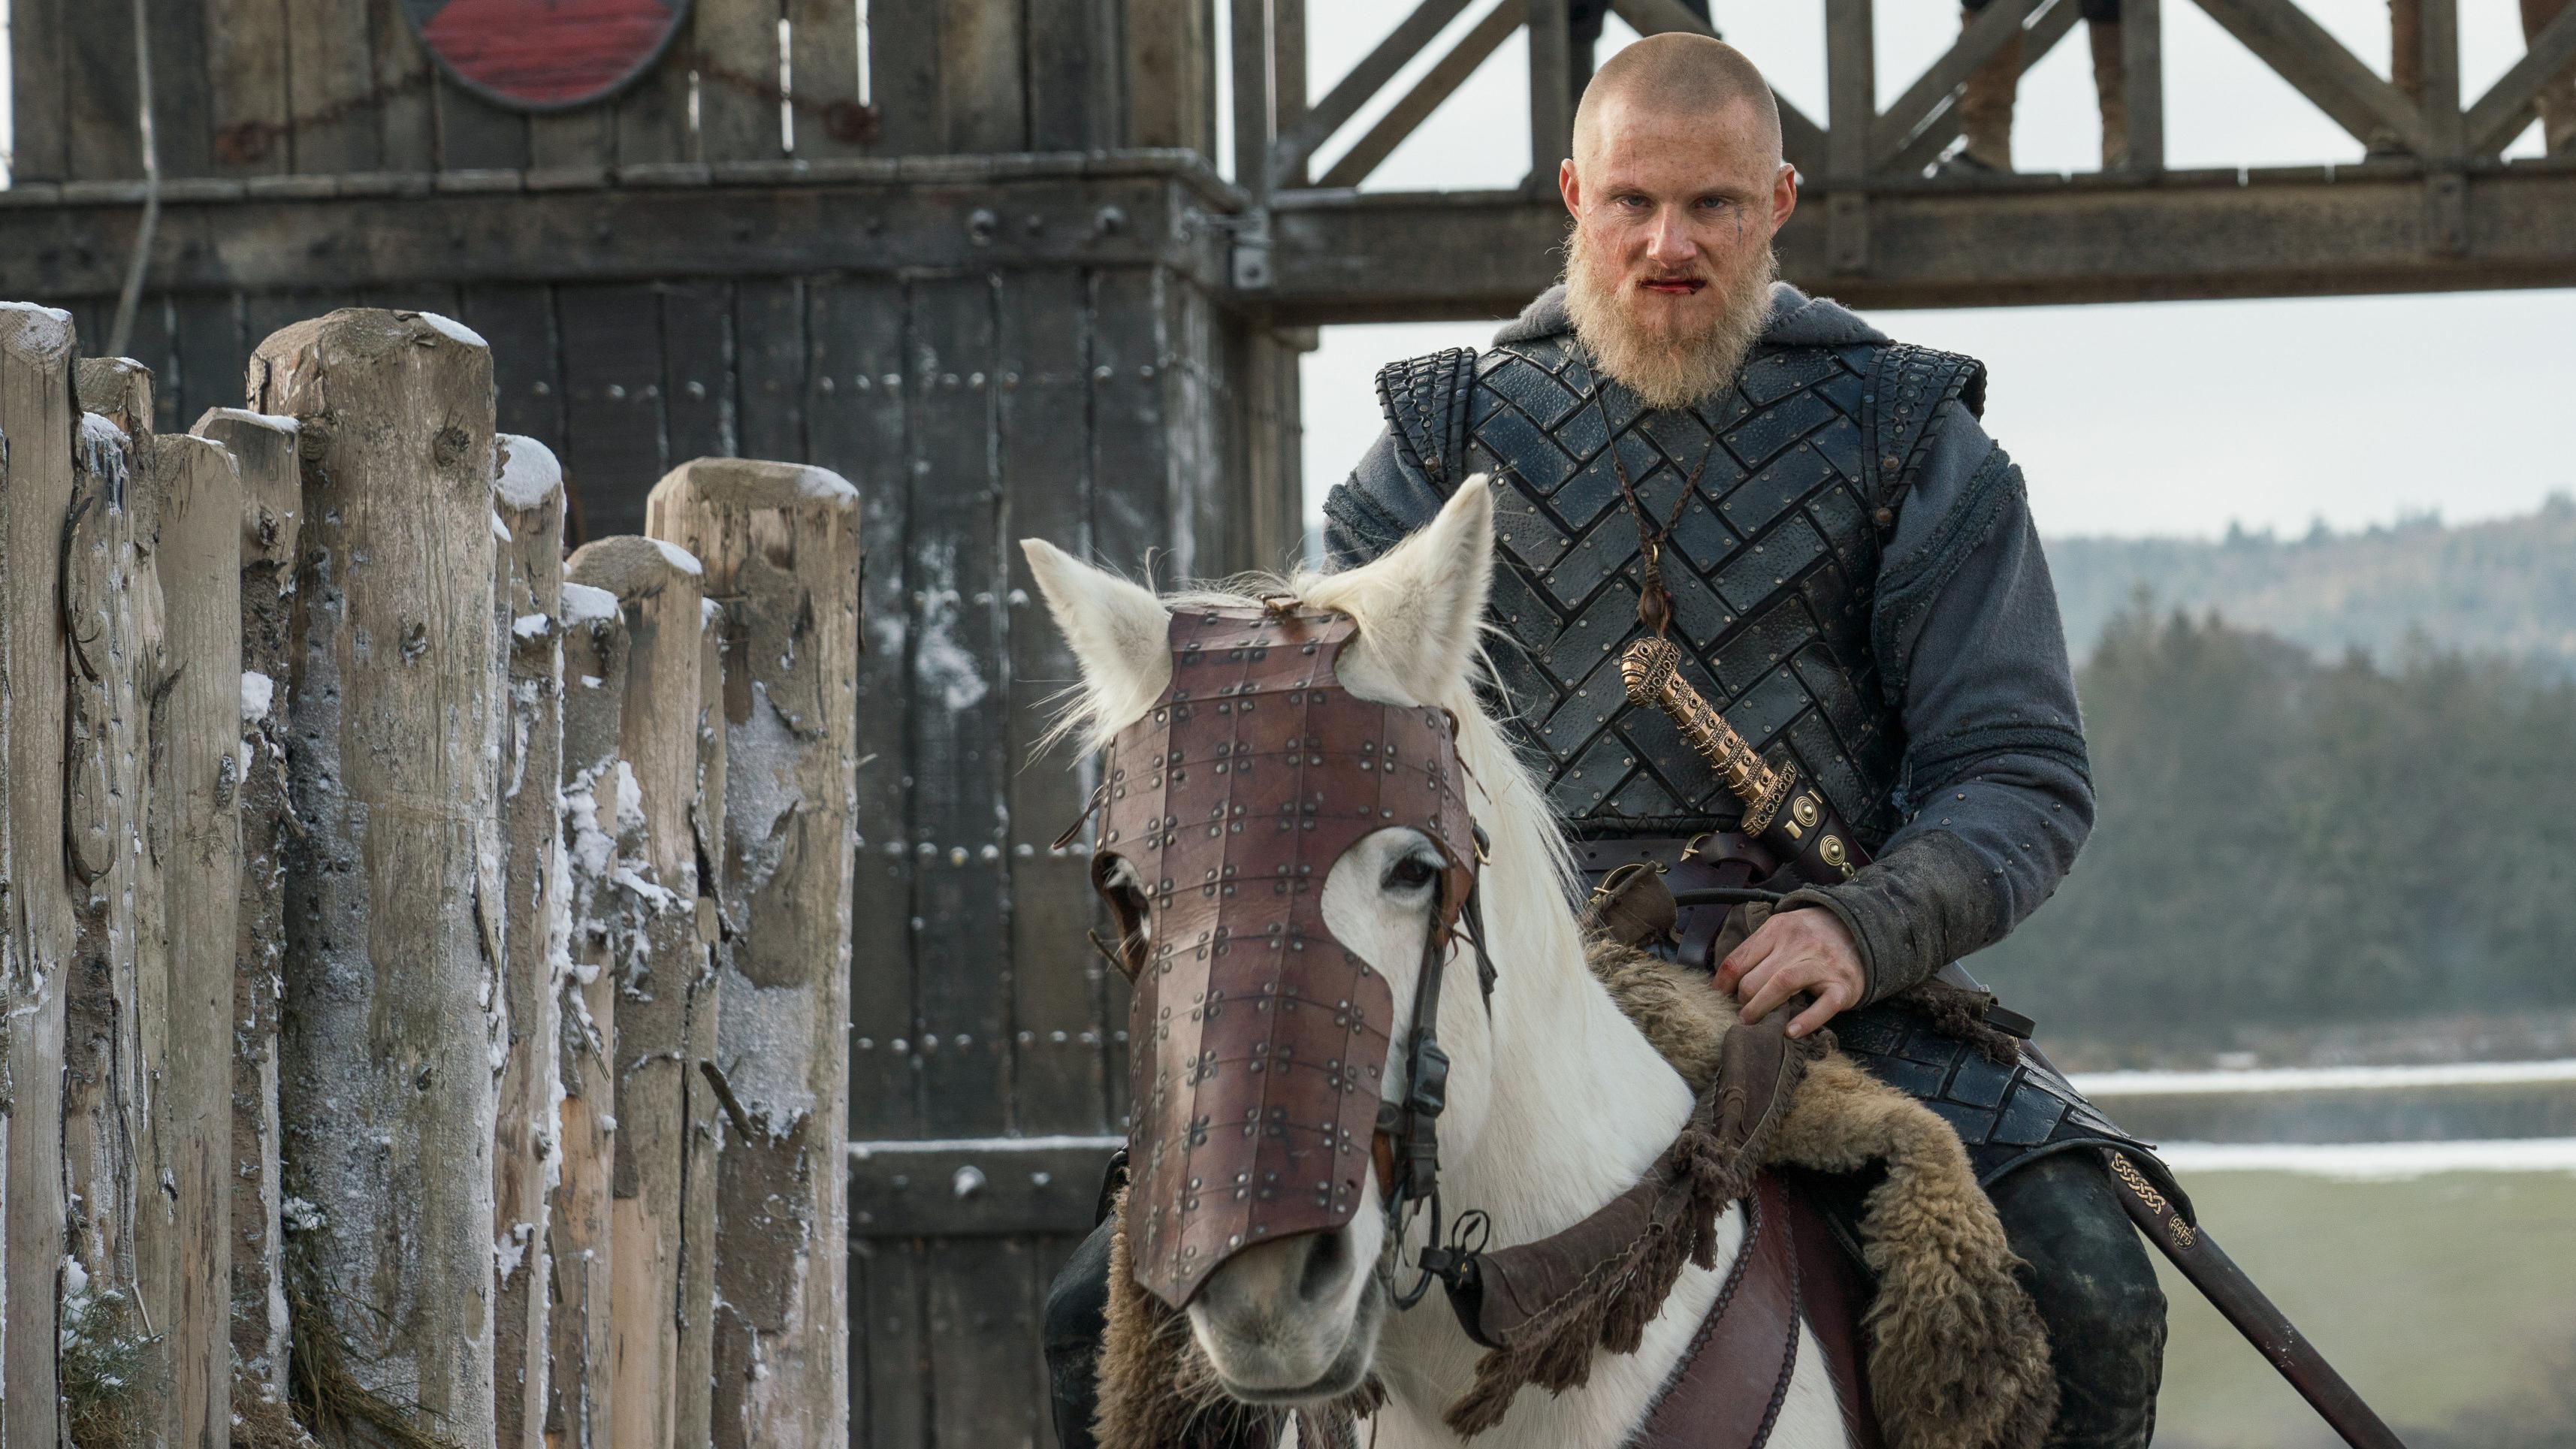 https www amazon com vikings season 6 part 2 dp b08qr9cqlx